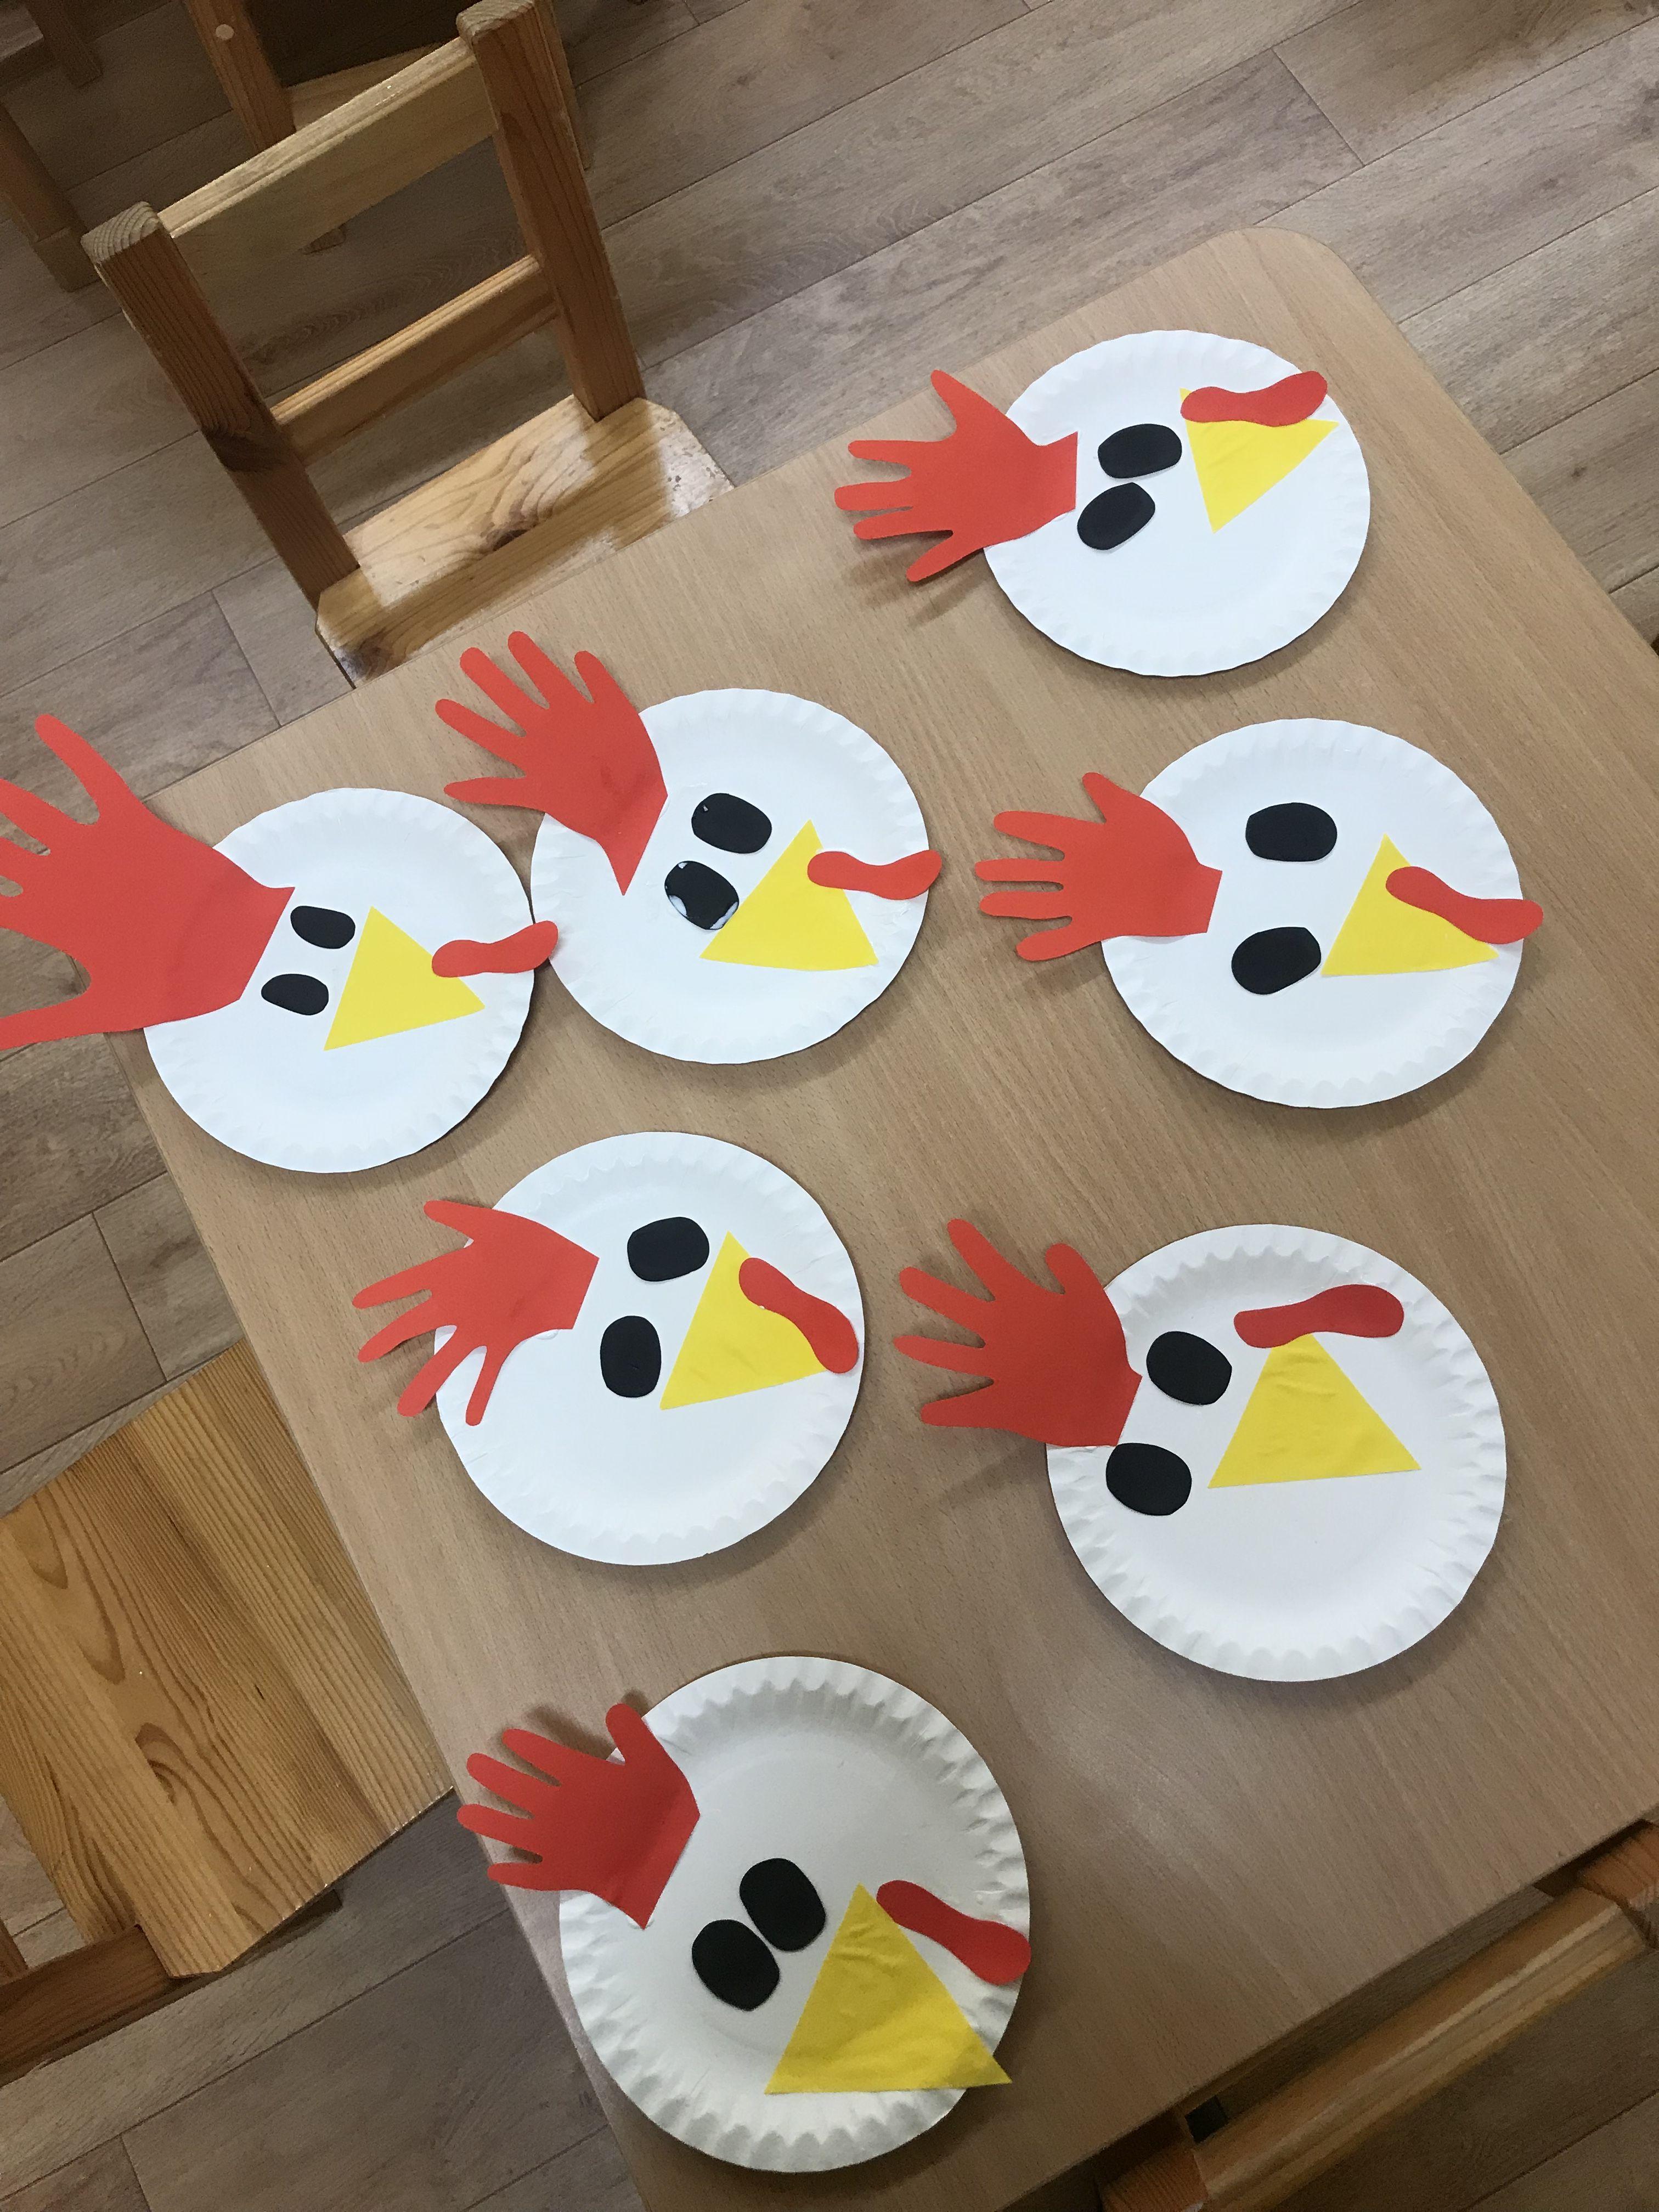 angry birds adventi naptár 1,5 2 gadi | Gailītis. No 1,5 2 gadi. | Pinterest angry birds adventi naptár